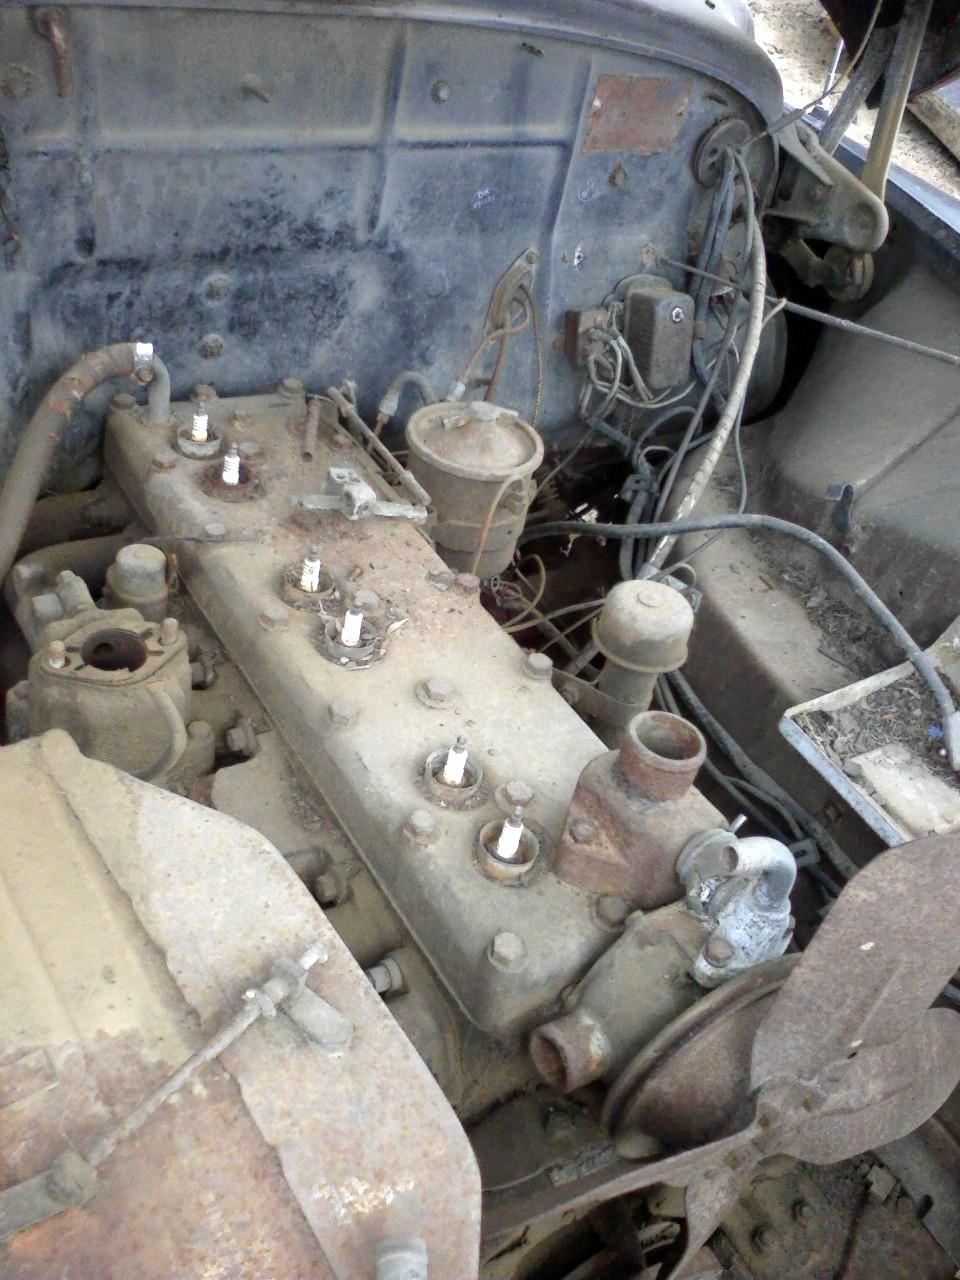 Escort 95 4dr ford motor